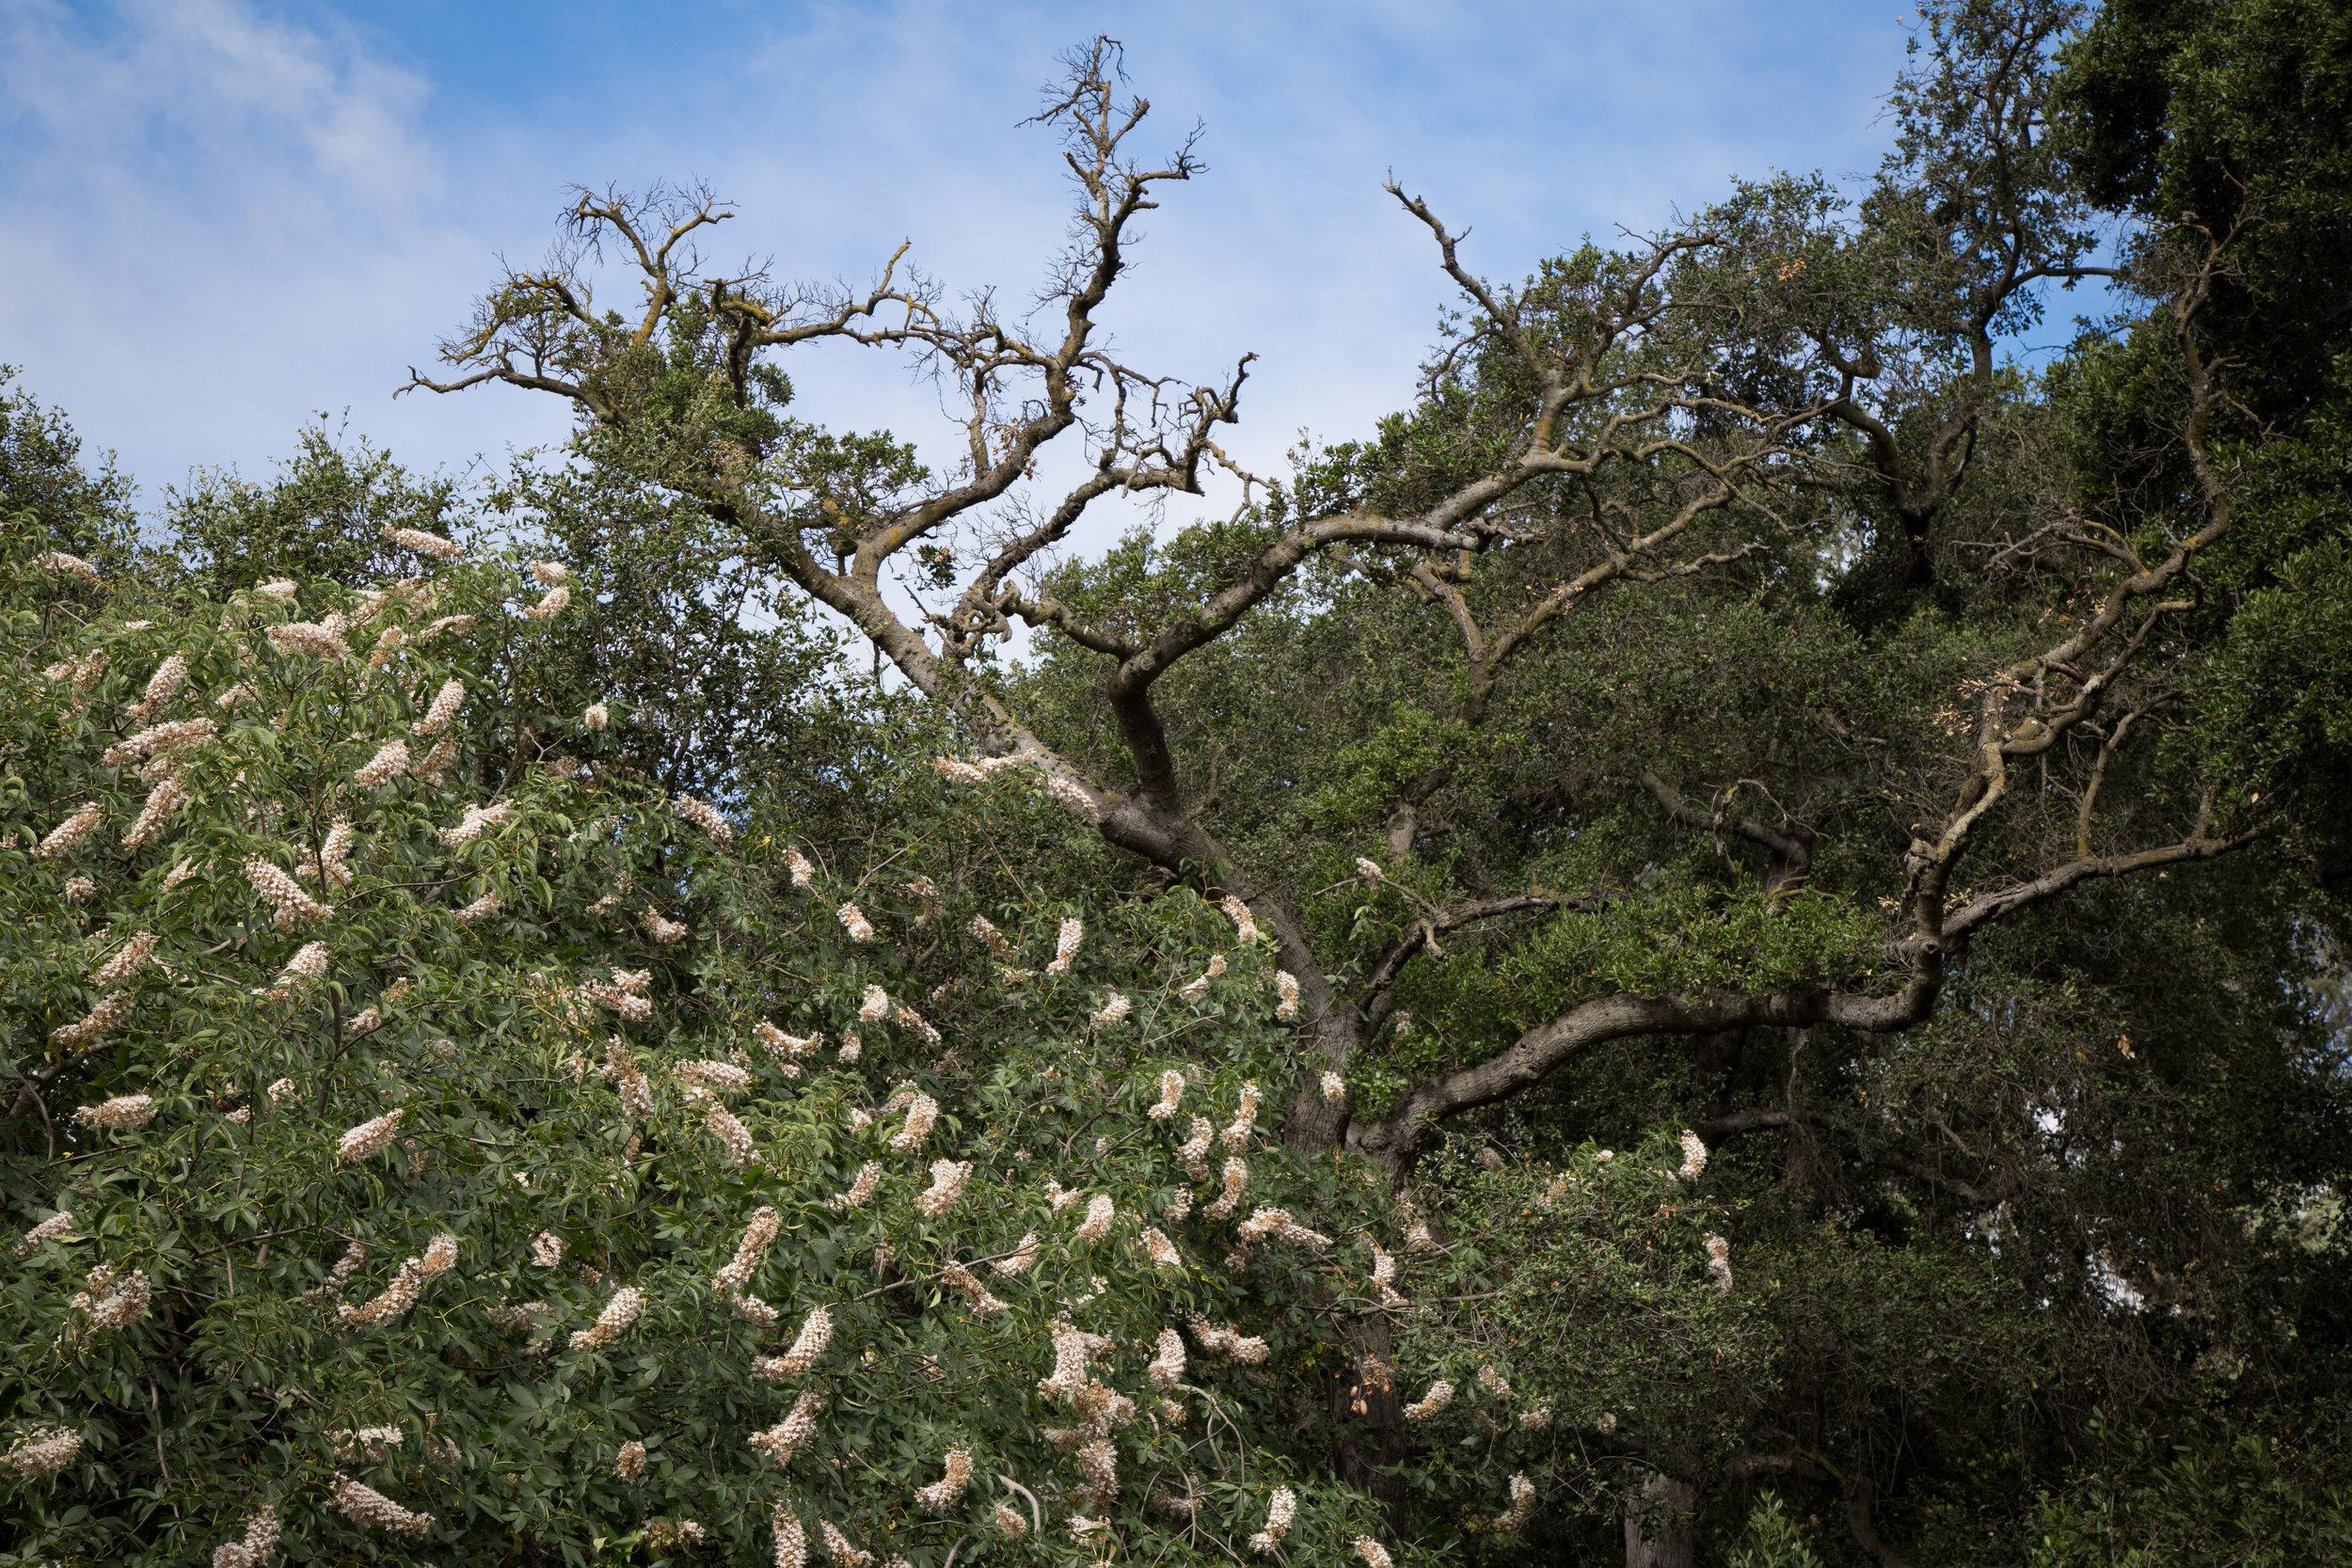 California Buckwheat and Oak